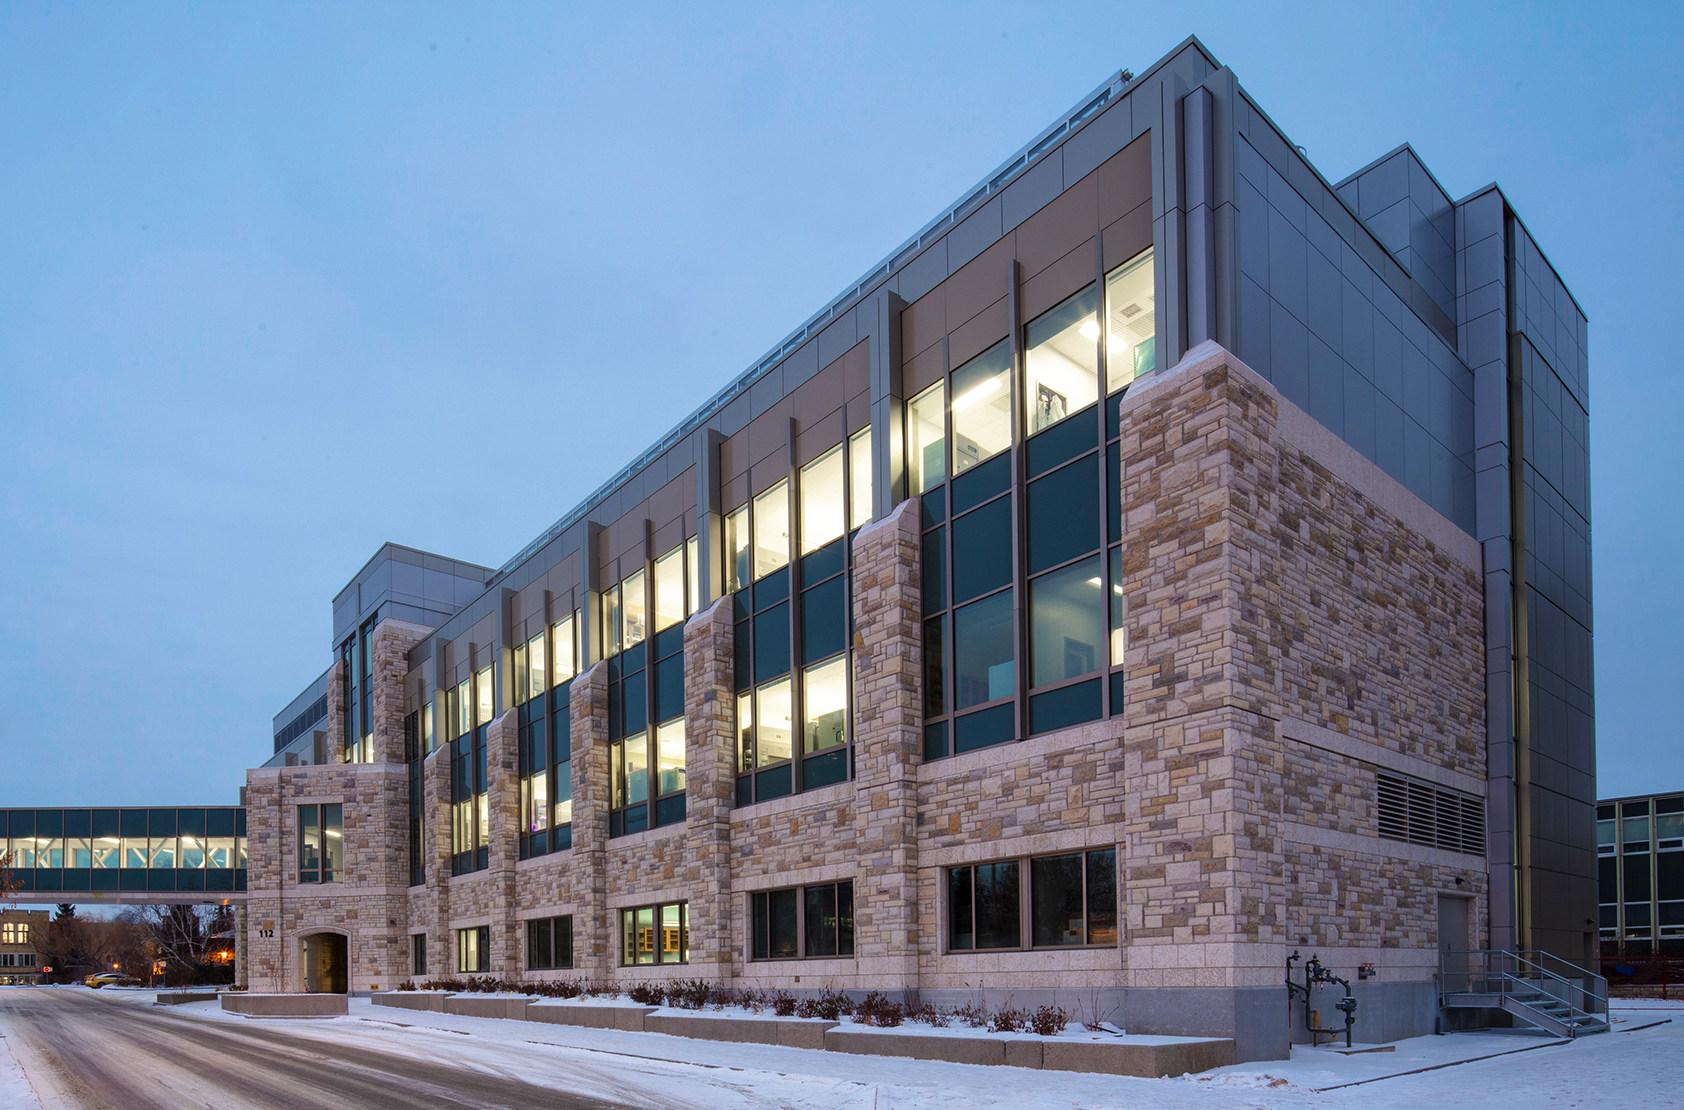 University of Saskatchewan - Collaborative Science Research Building